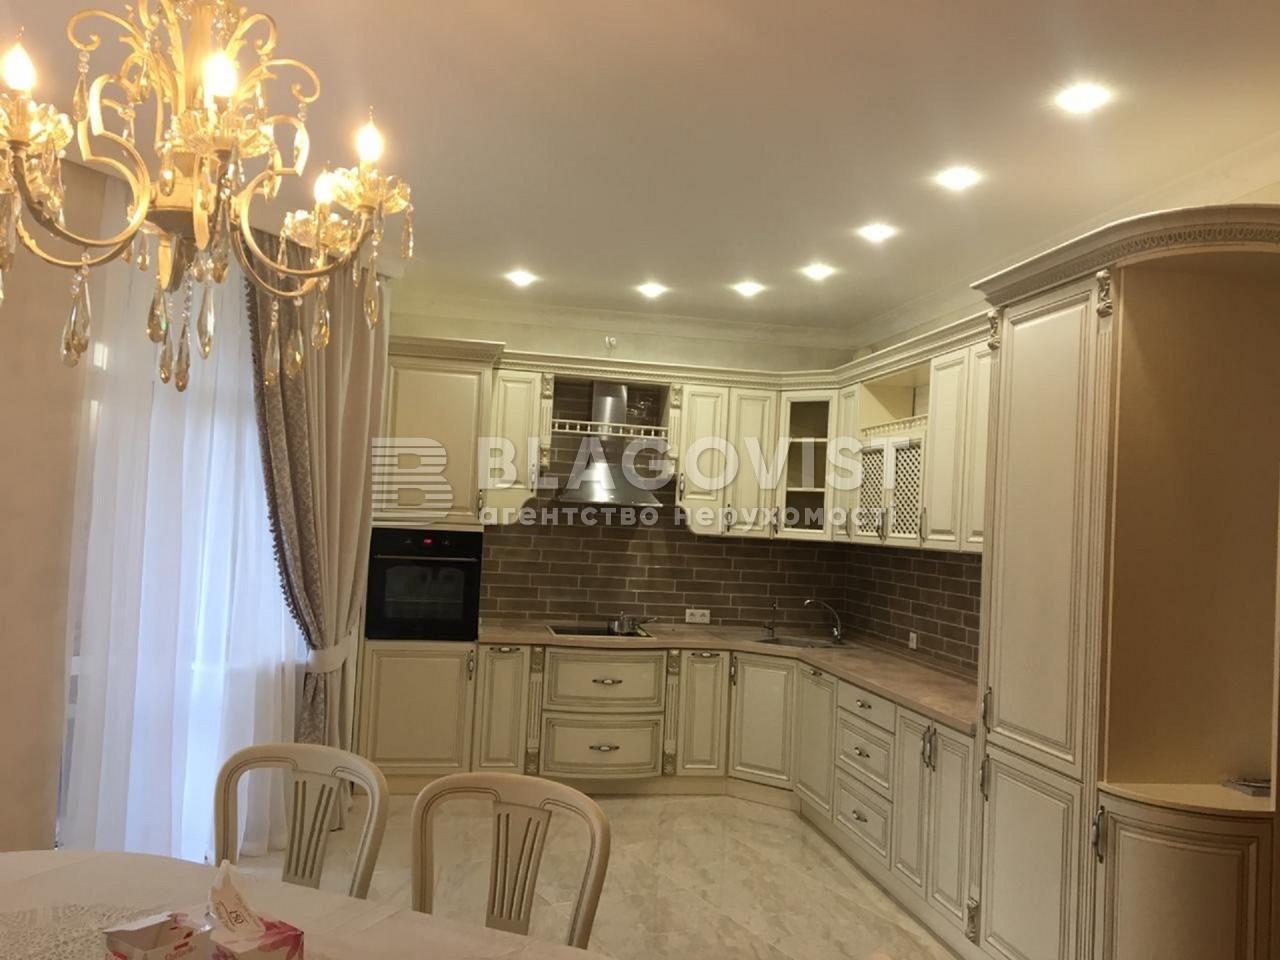 Квартира Z-367797, Дмитриевская, 48г, Киев - Фото 15